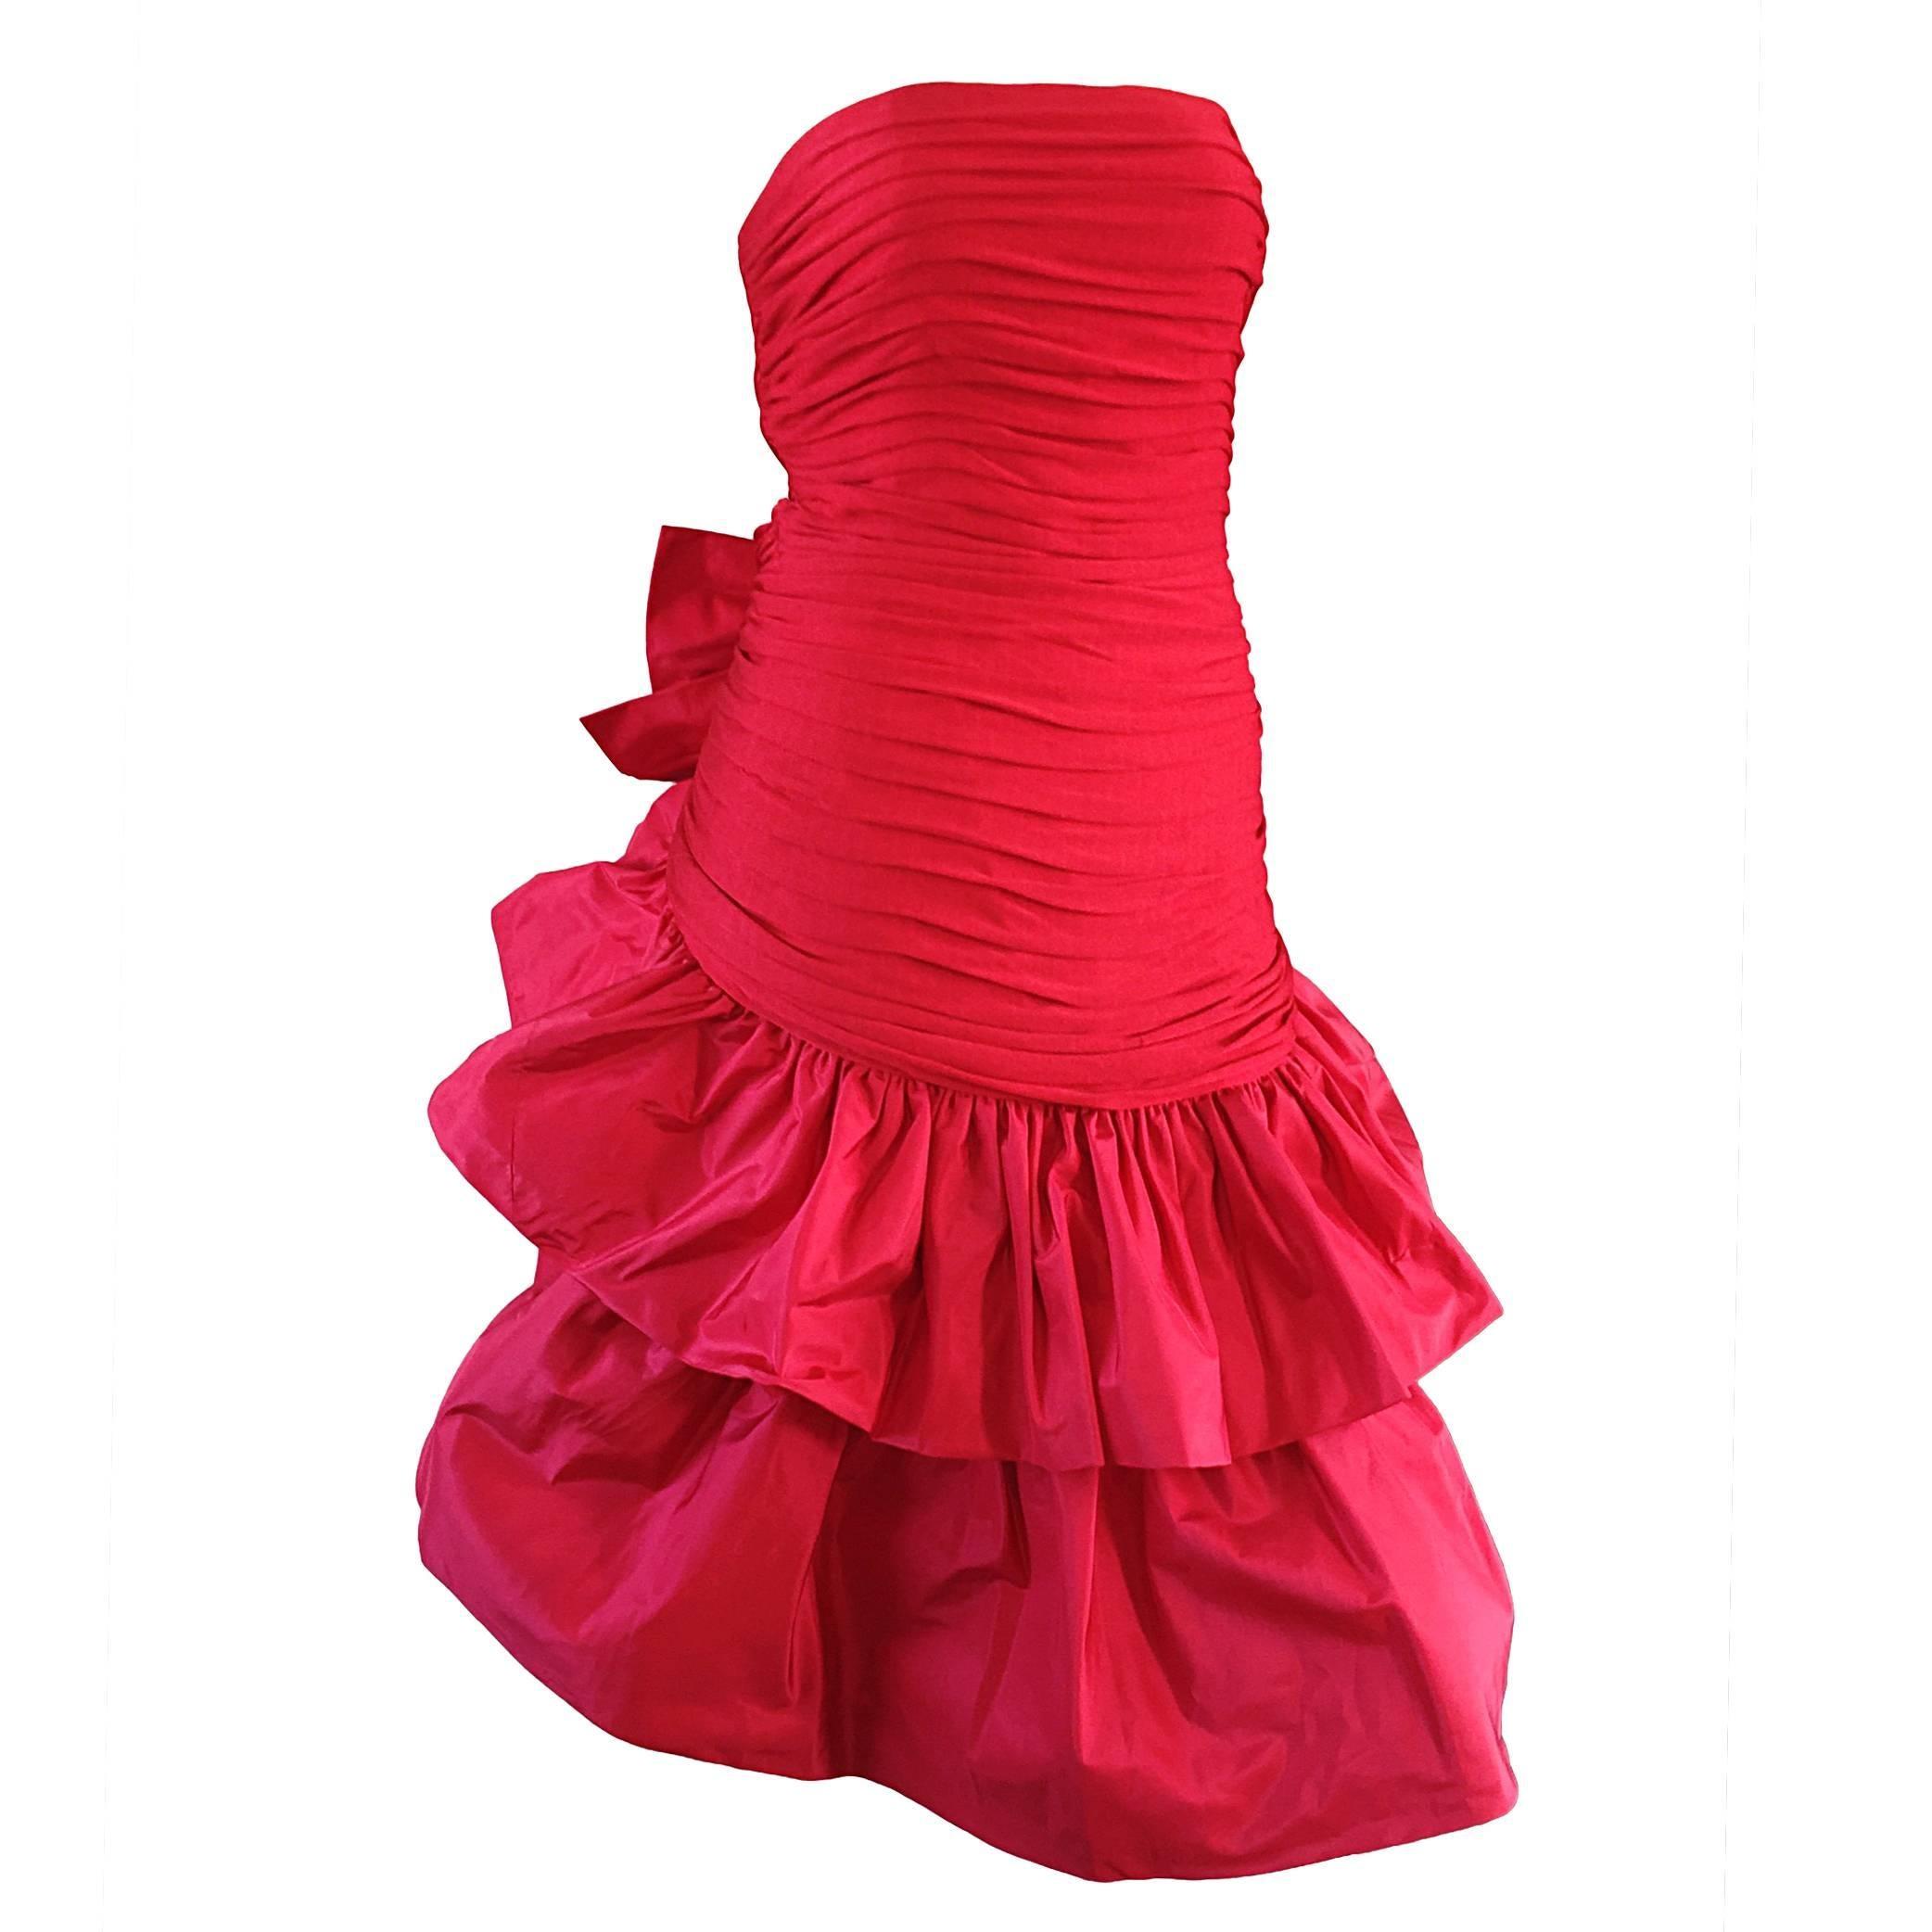 Vintage Jill Richards 1980s For Saks Fifth Avenue Red Avant Garde Silk Dress